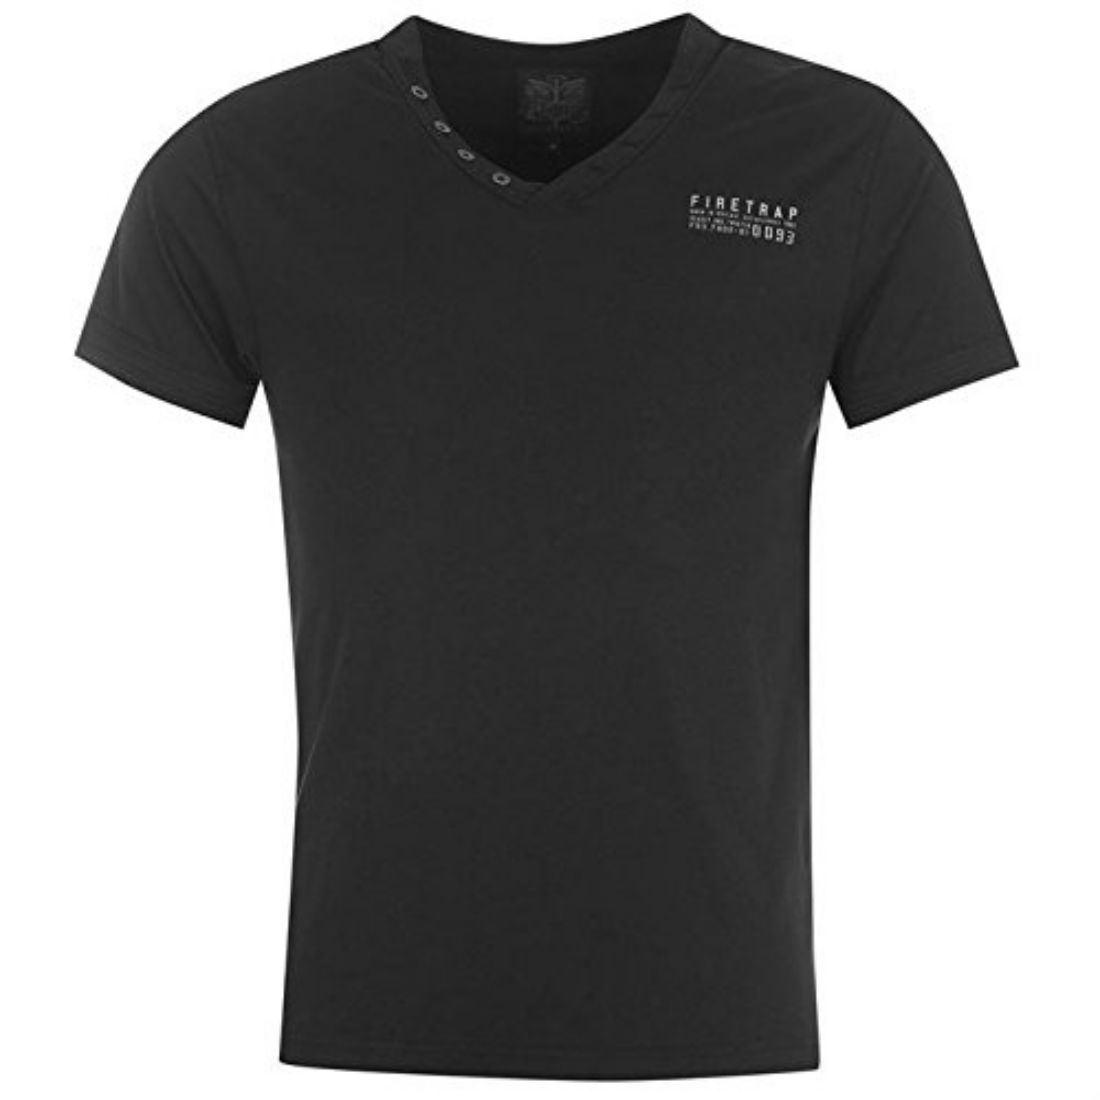 Firetrap Mens Striding V Neck T Shirt Short Sleeves Buttoned Collar Cotton Top